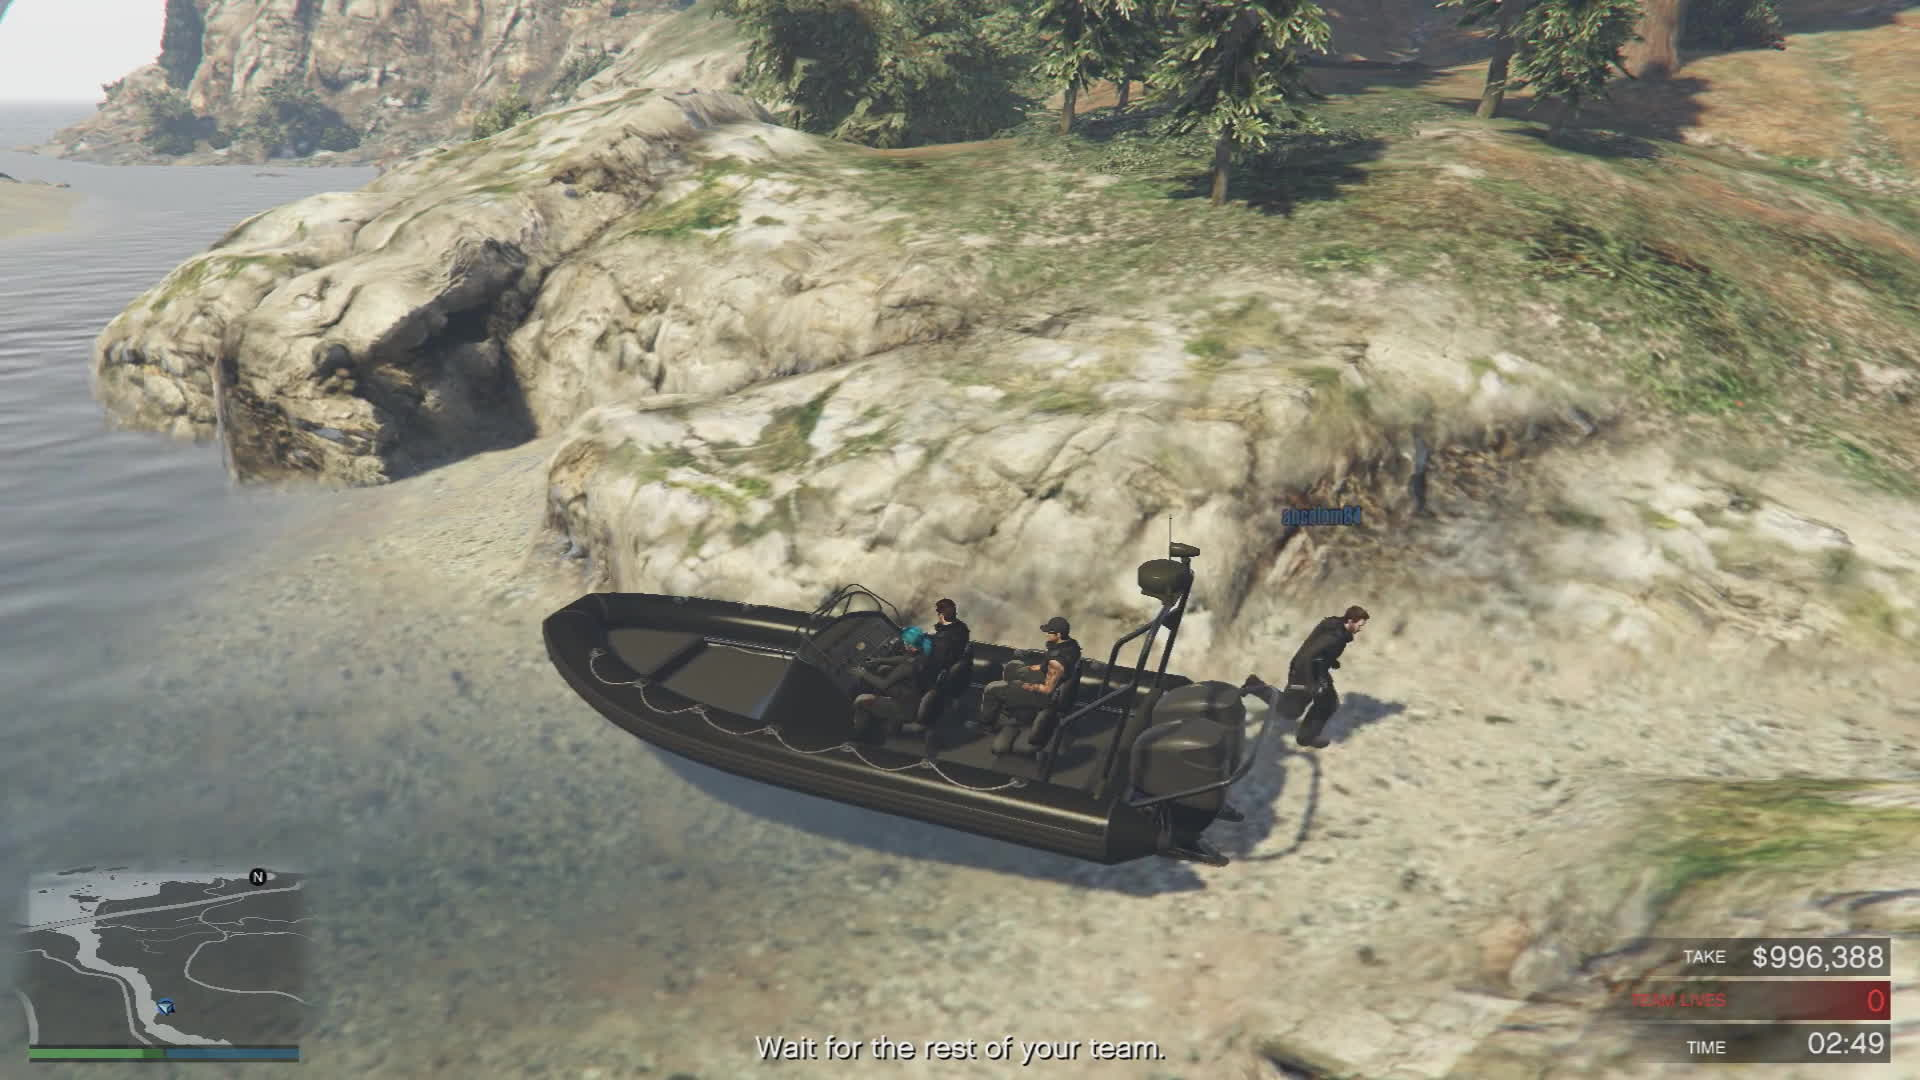 gtav, Smooth sailing GIFs